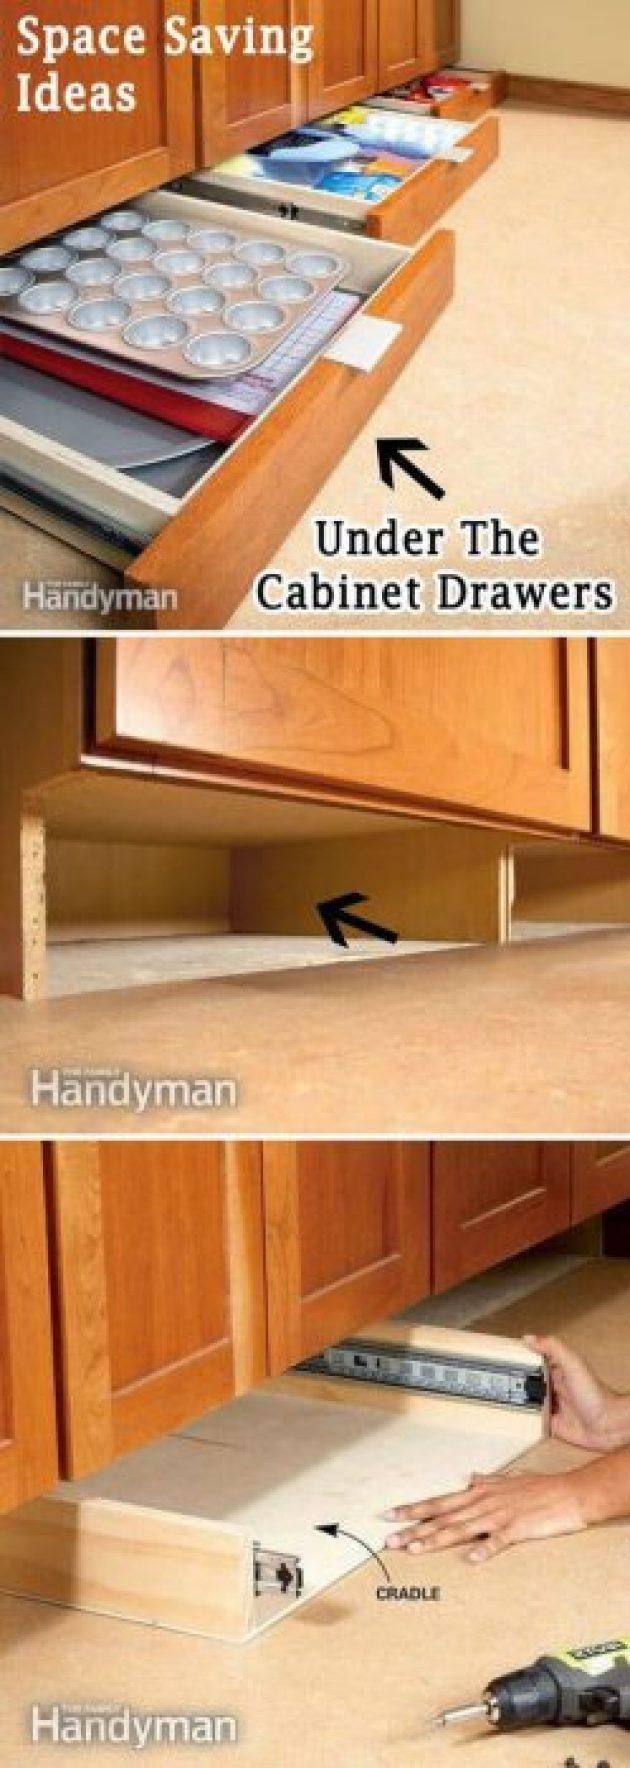 Storage Ideas for Small Spaces - Maximize the Space Beneath Kitchen Cabinets - Cabritonyc.com